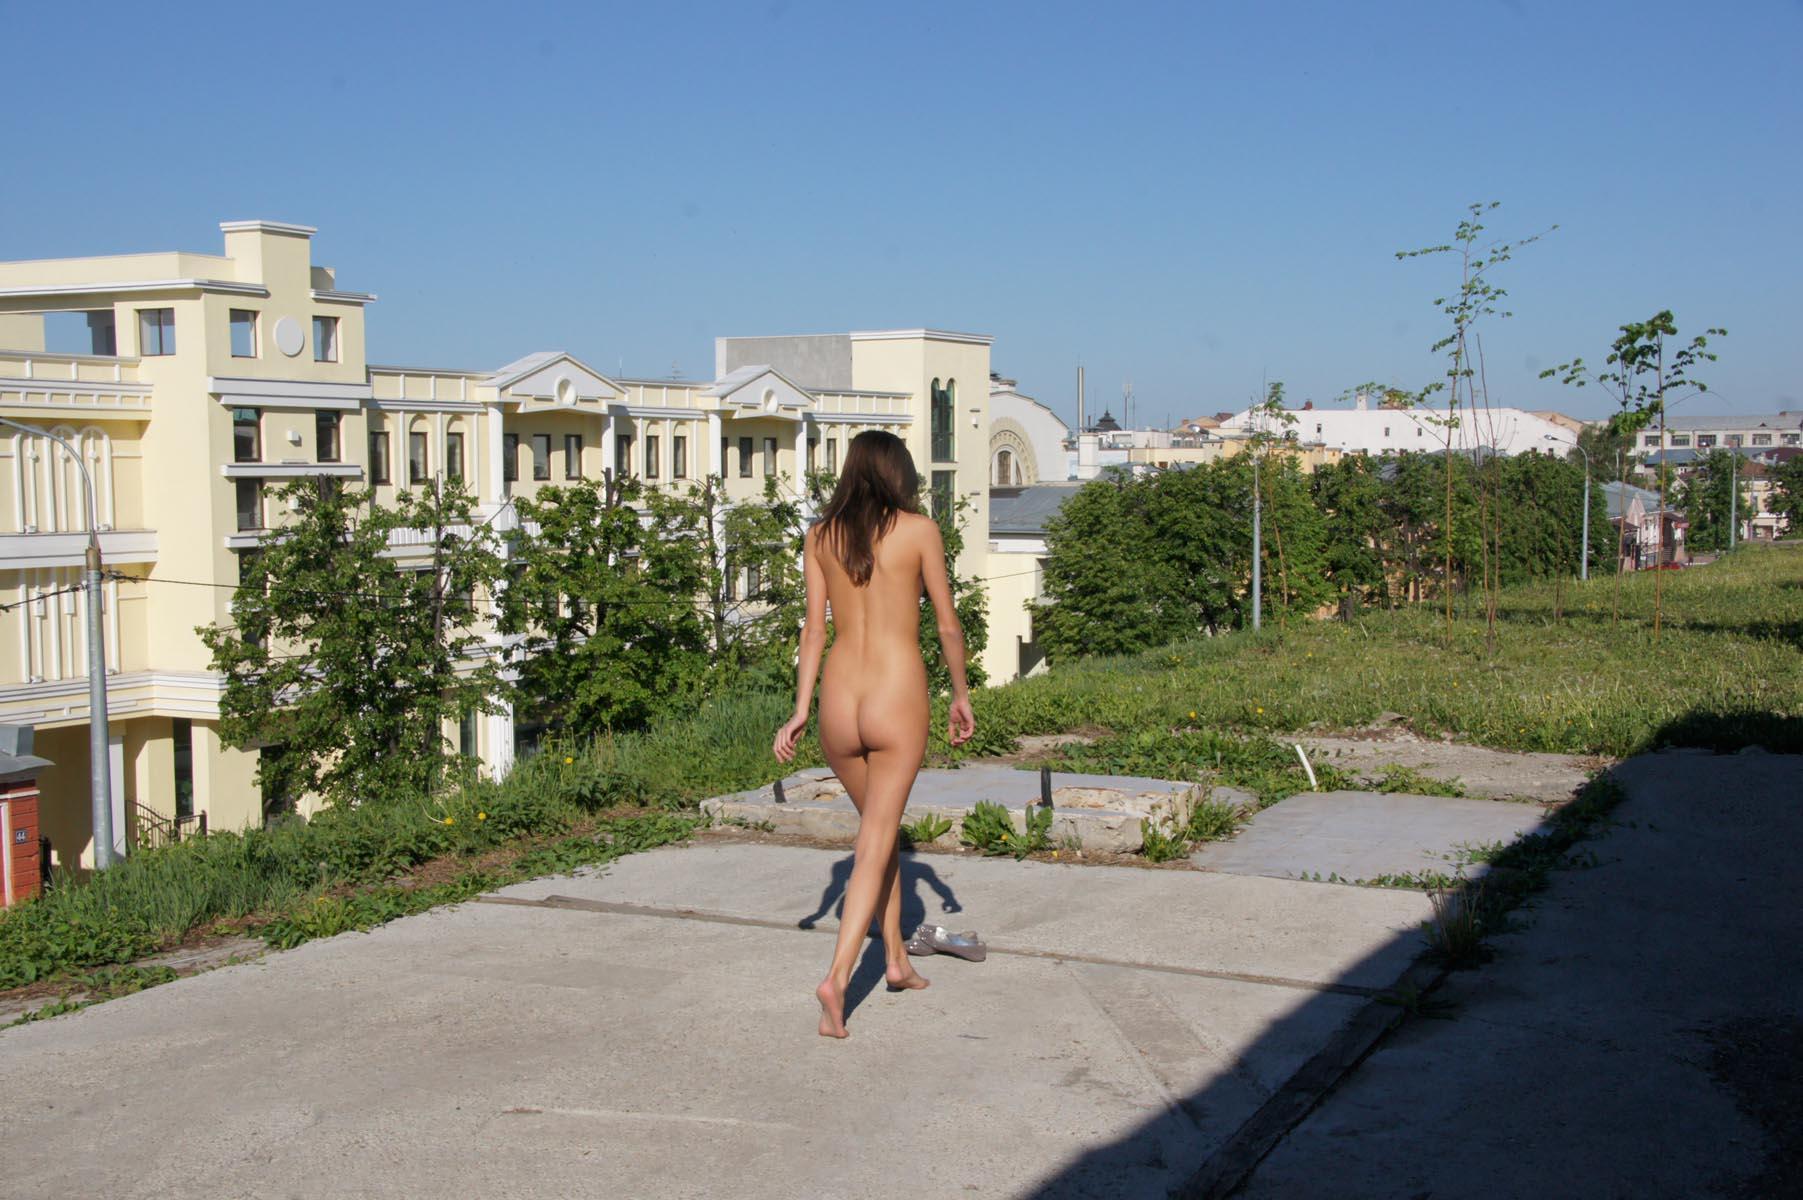 irina-k-naked-in-russia-kazan-nude-public-35